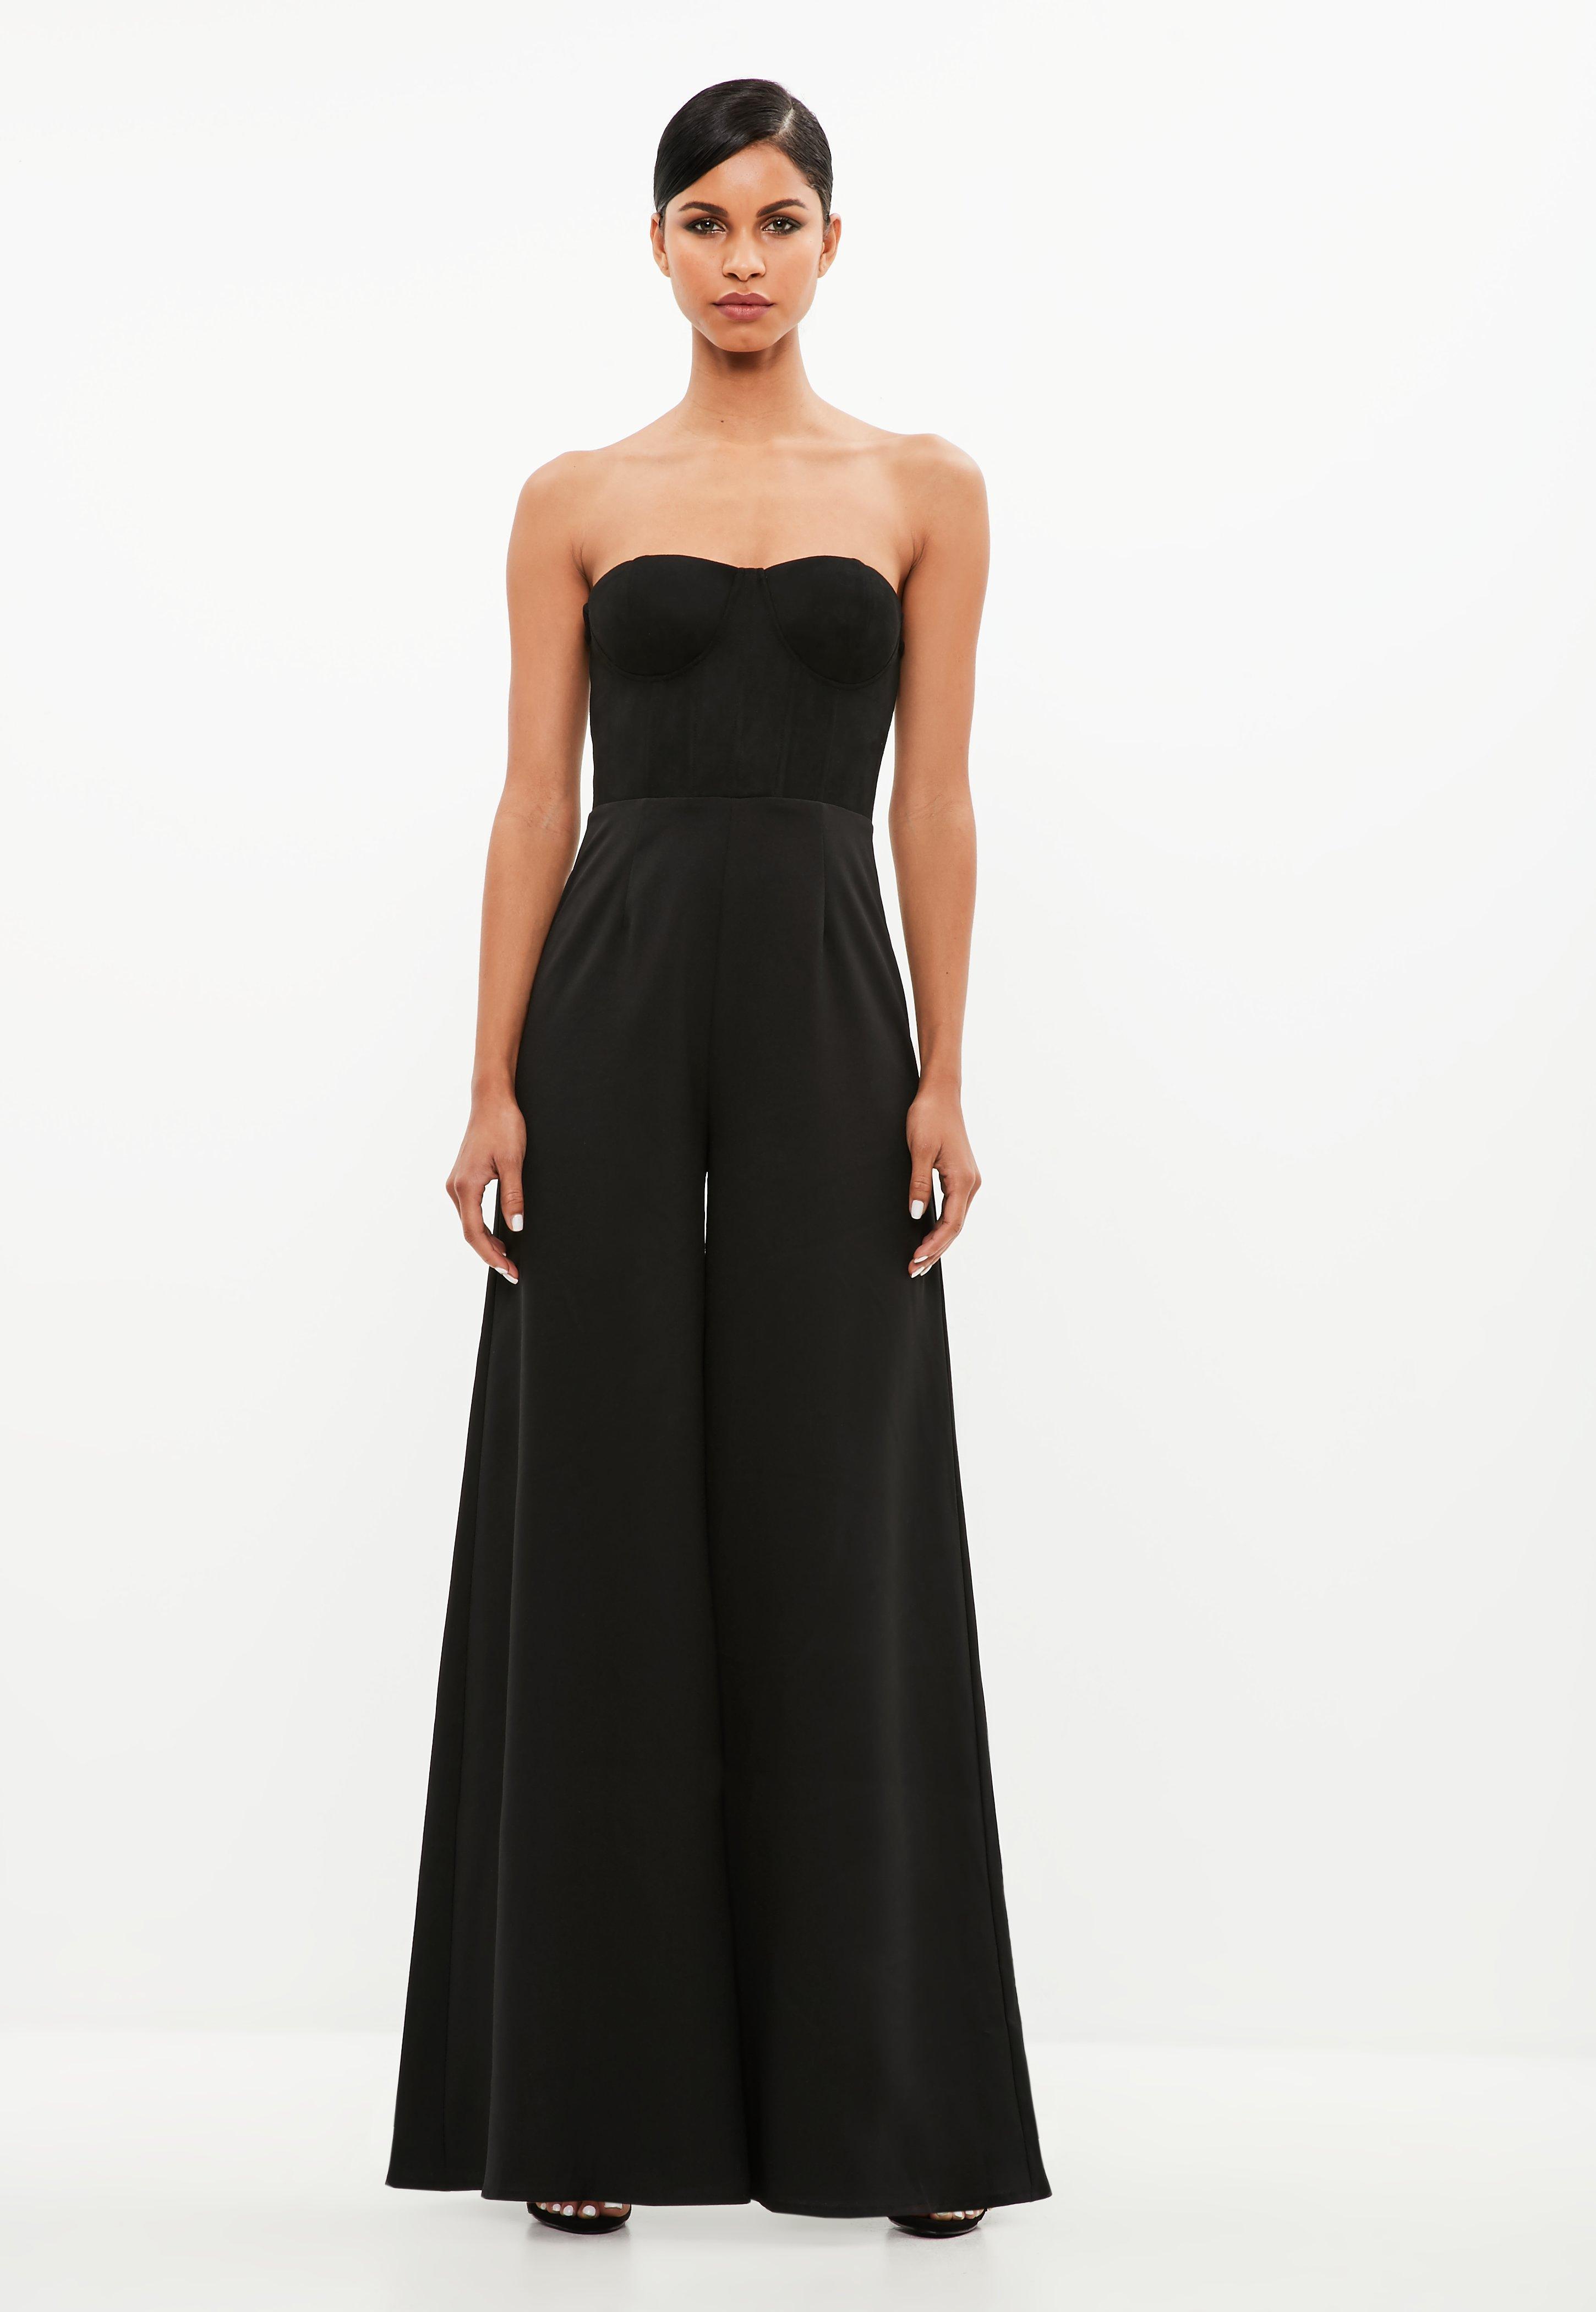 Black Party Dresses for Women